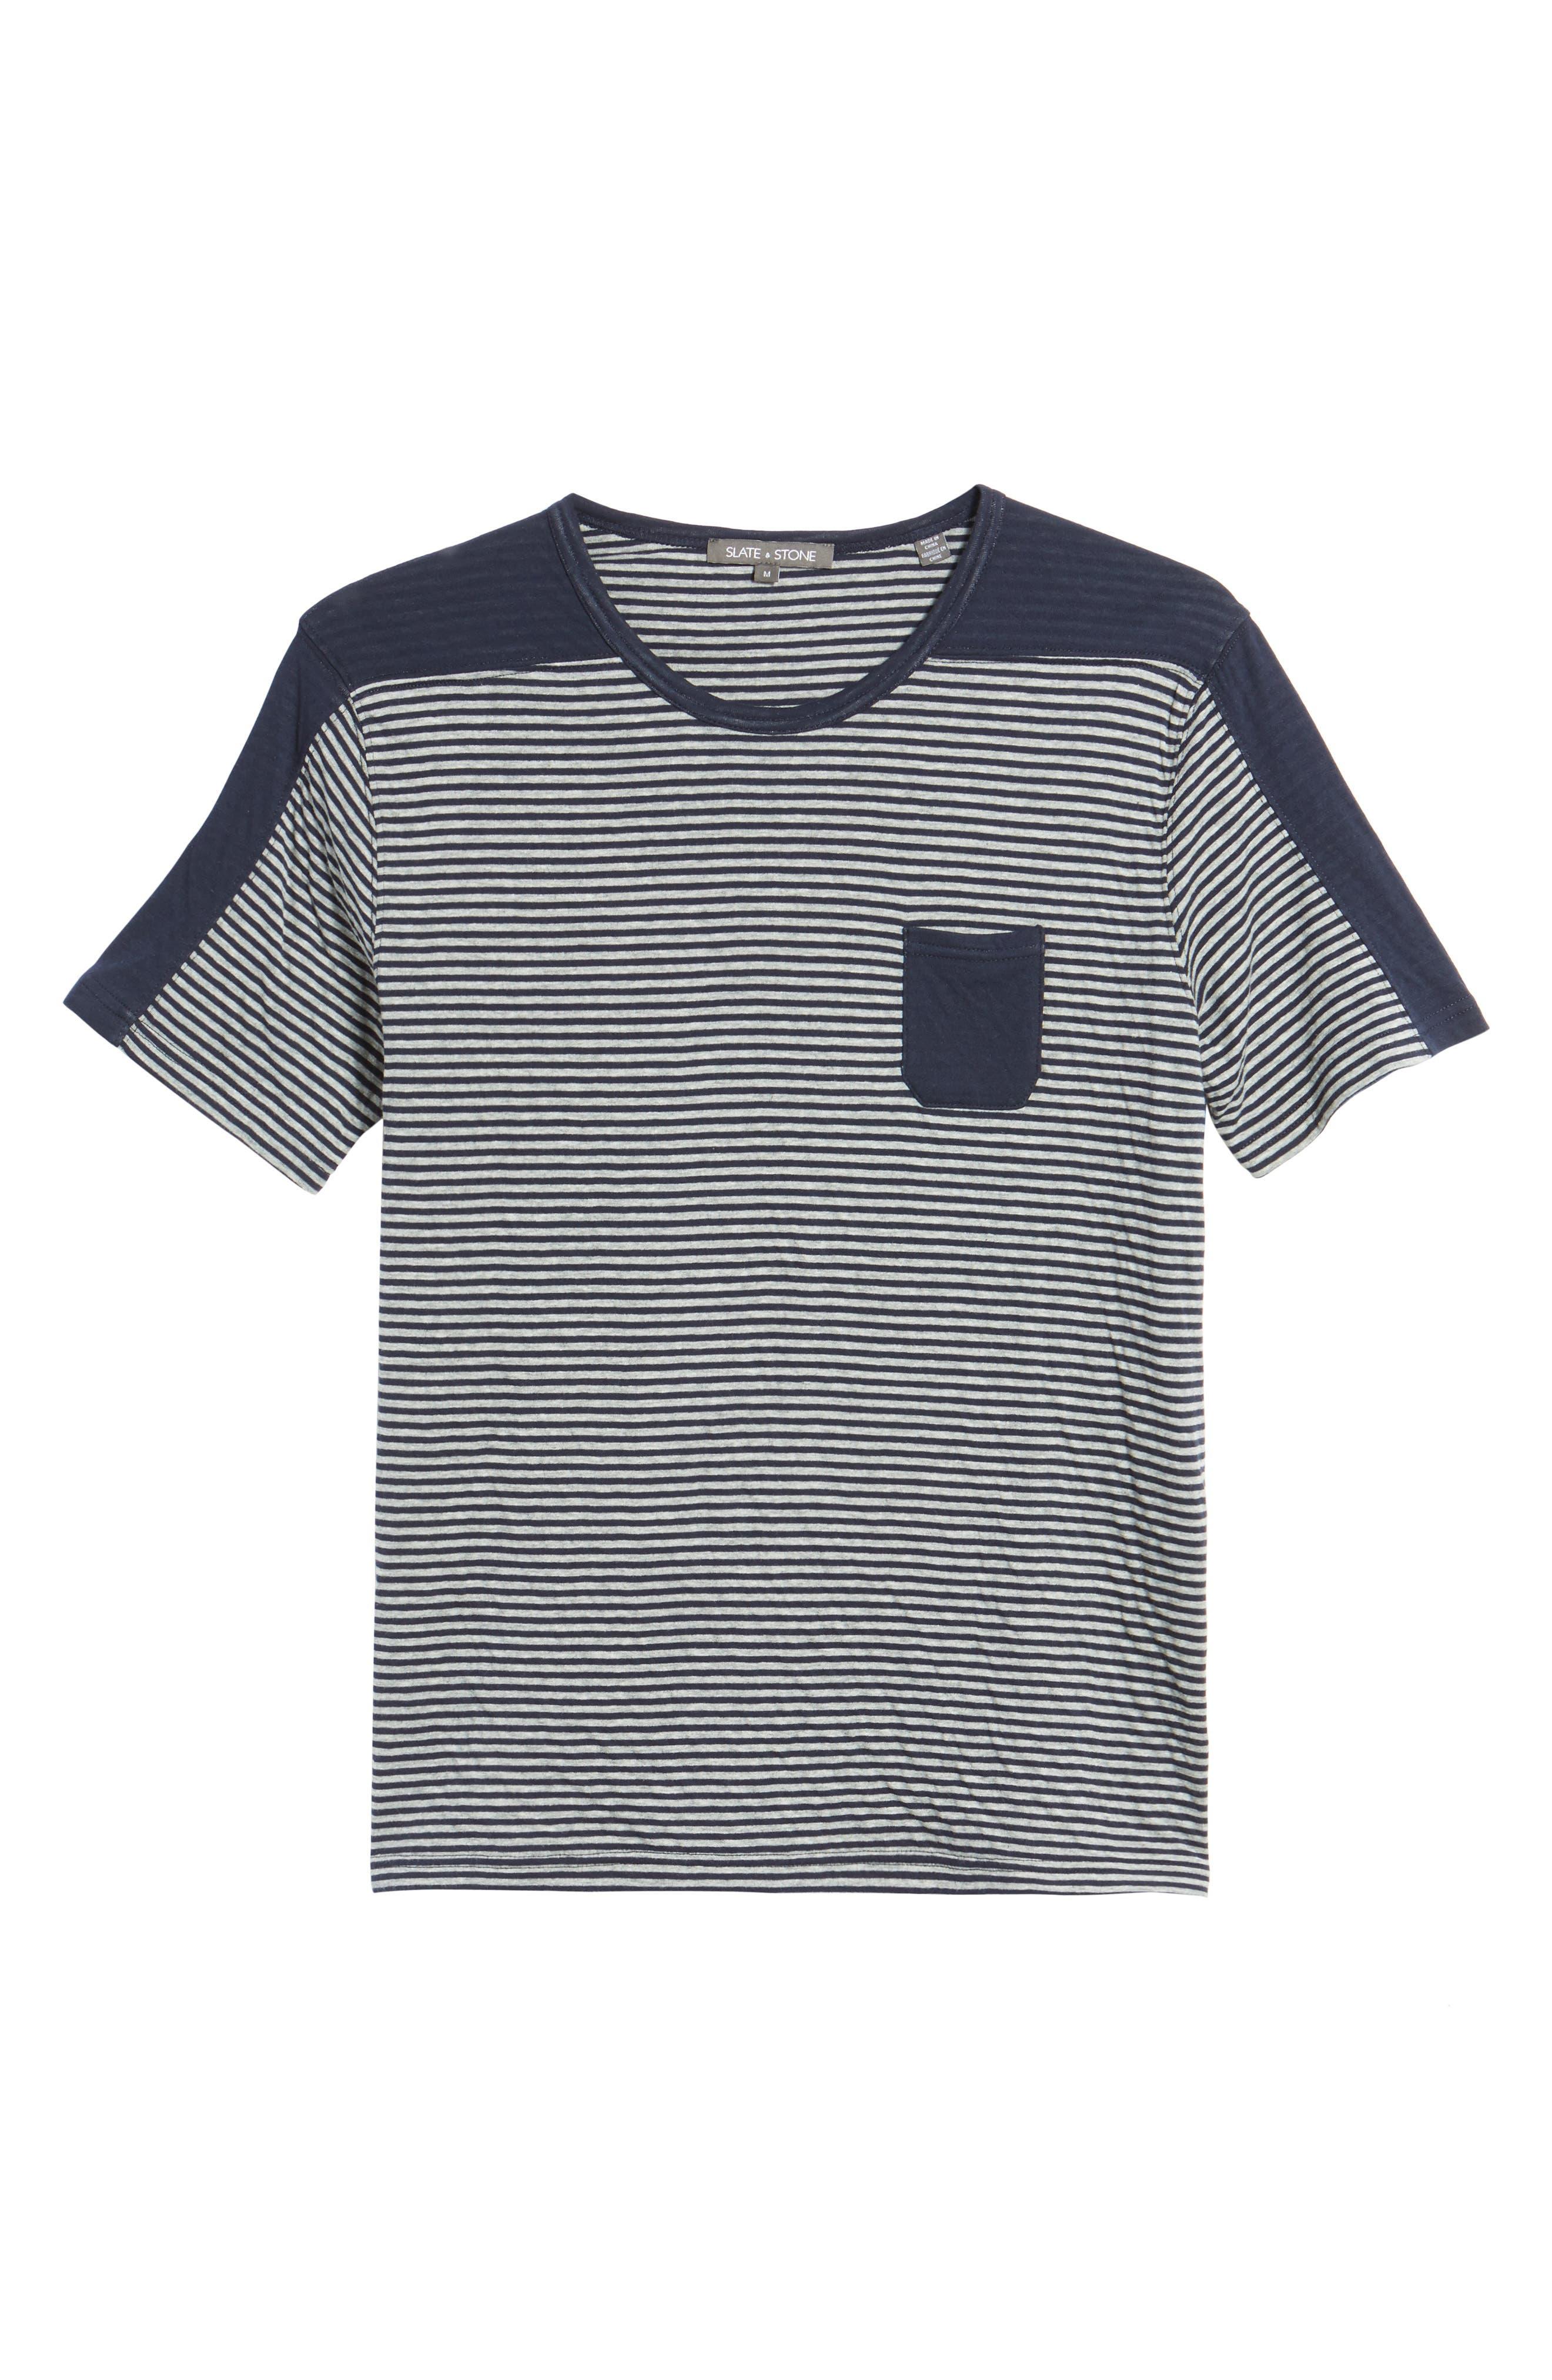 Striped Pocket T-Shirt,                             Alternate thumbnail 6, color,                             Navy/ White Stripe